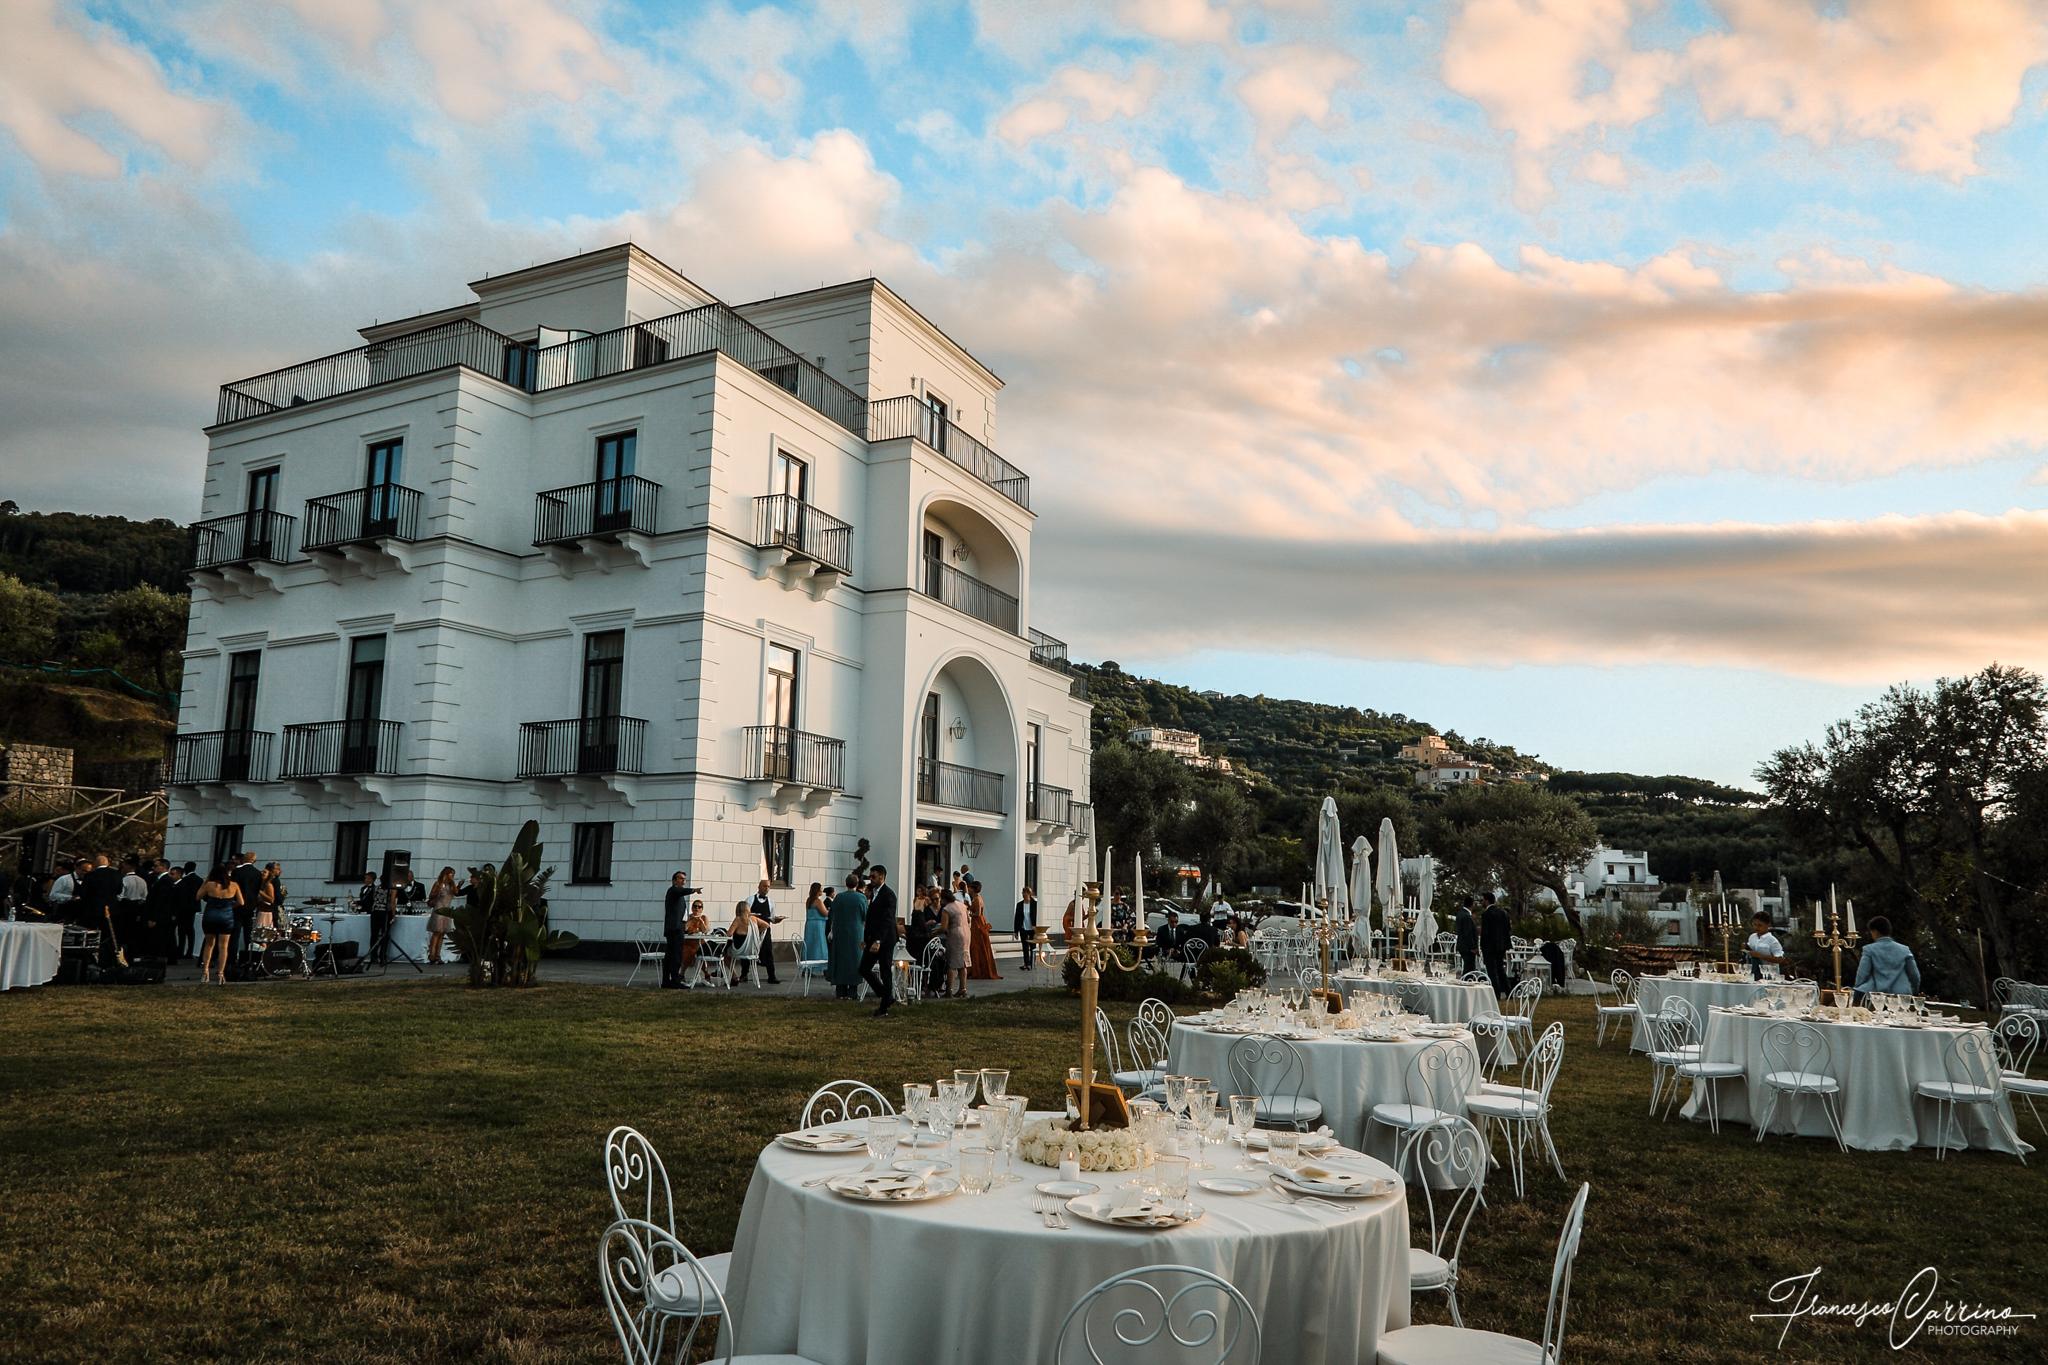 https://www.weddingamalfi.com/wp-content/uploads/Giannenza-13-luglio-2019-35.jpg